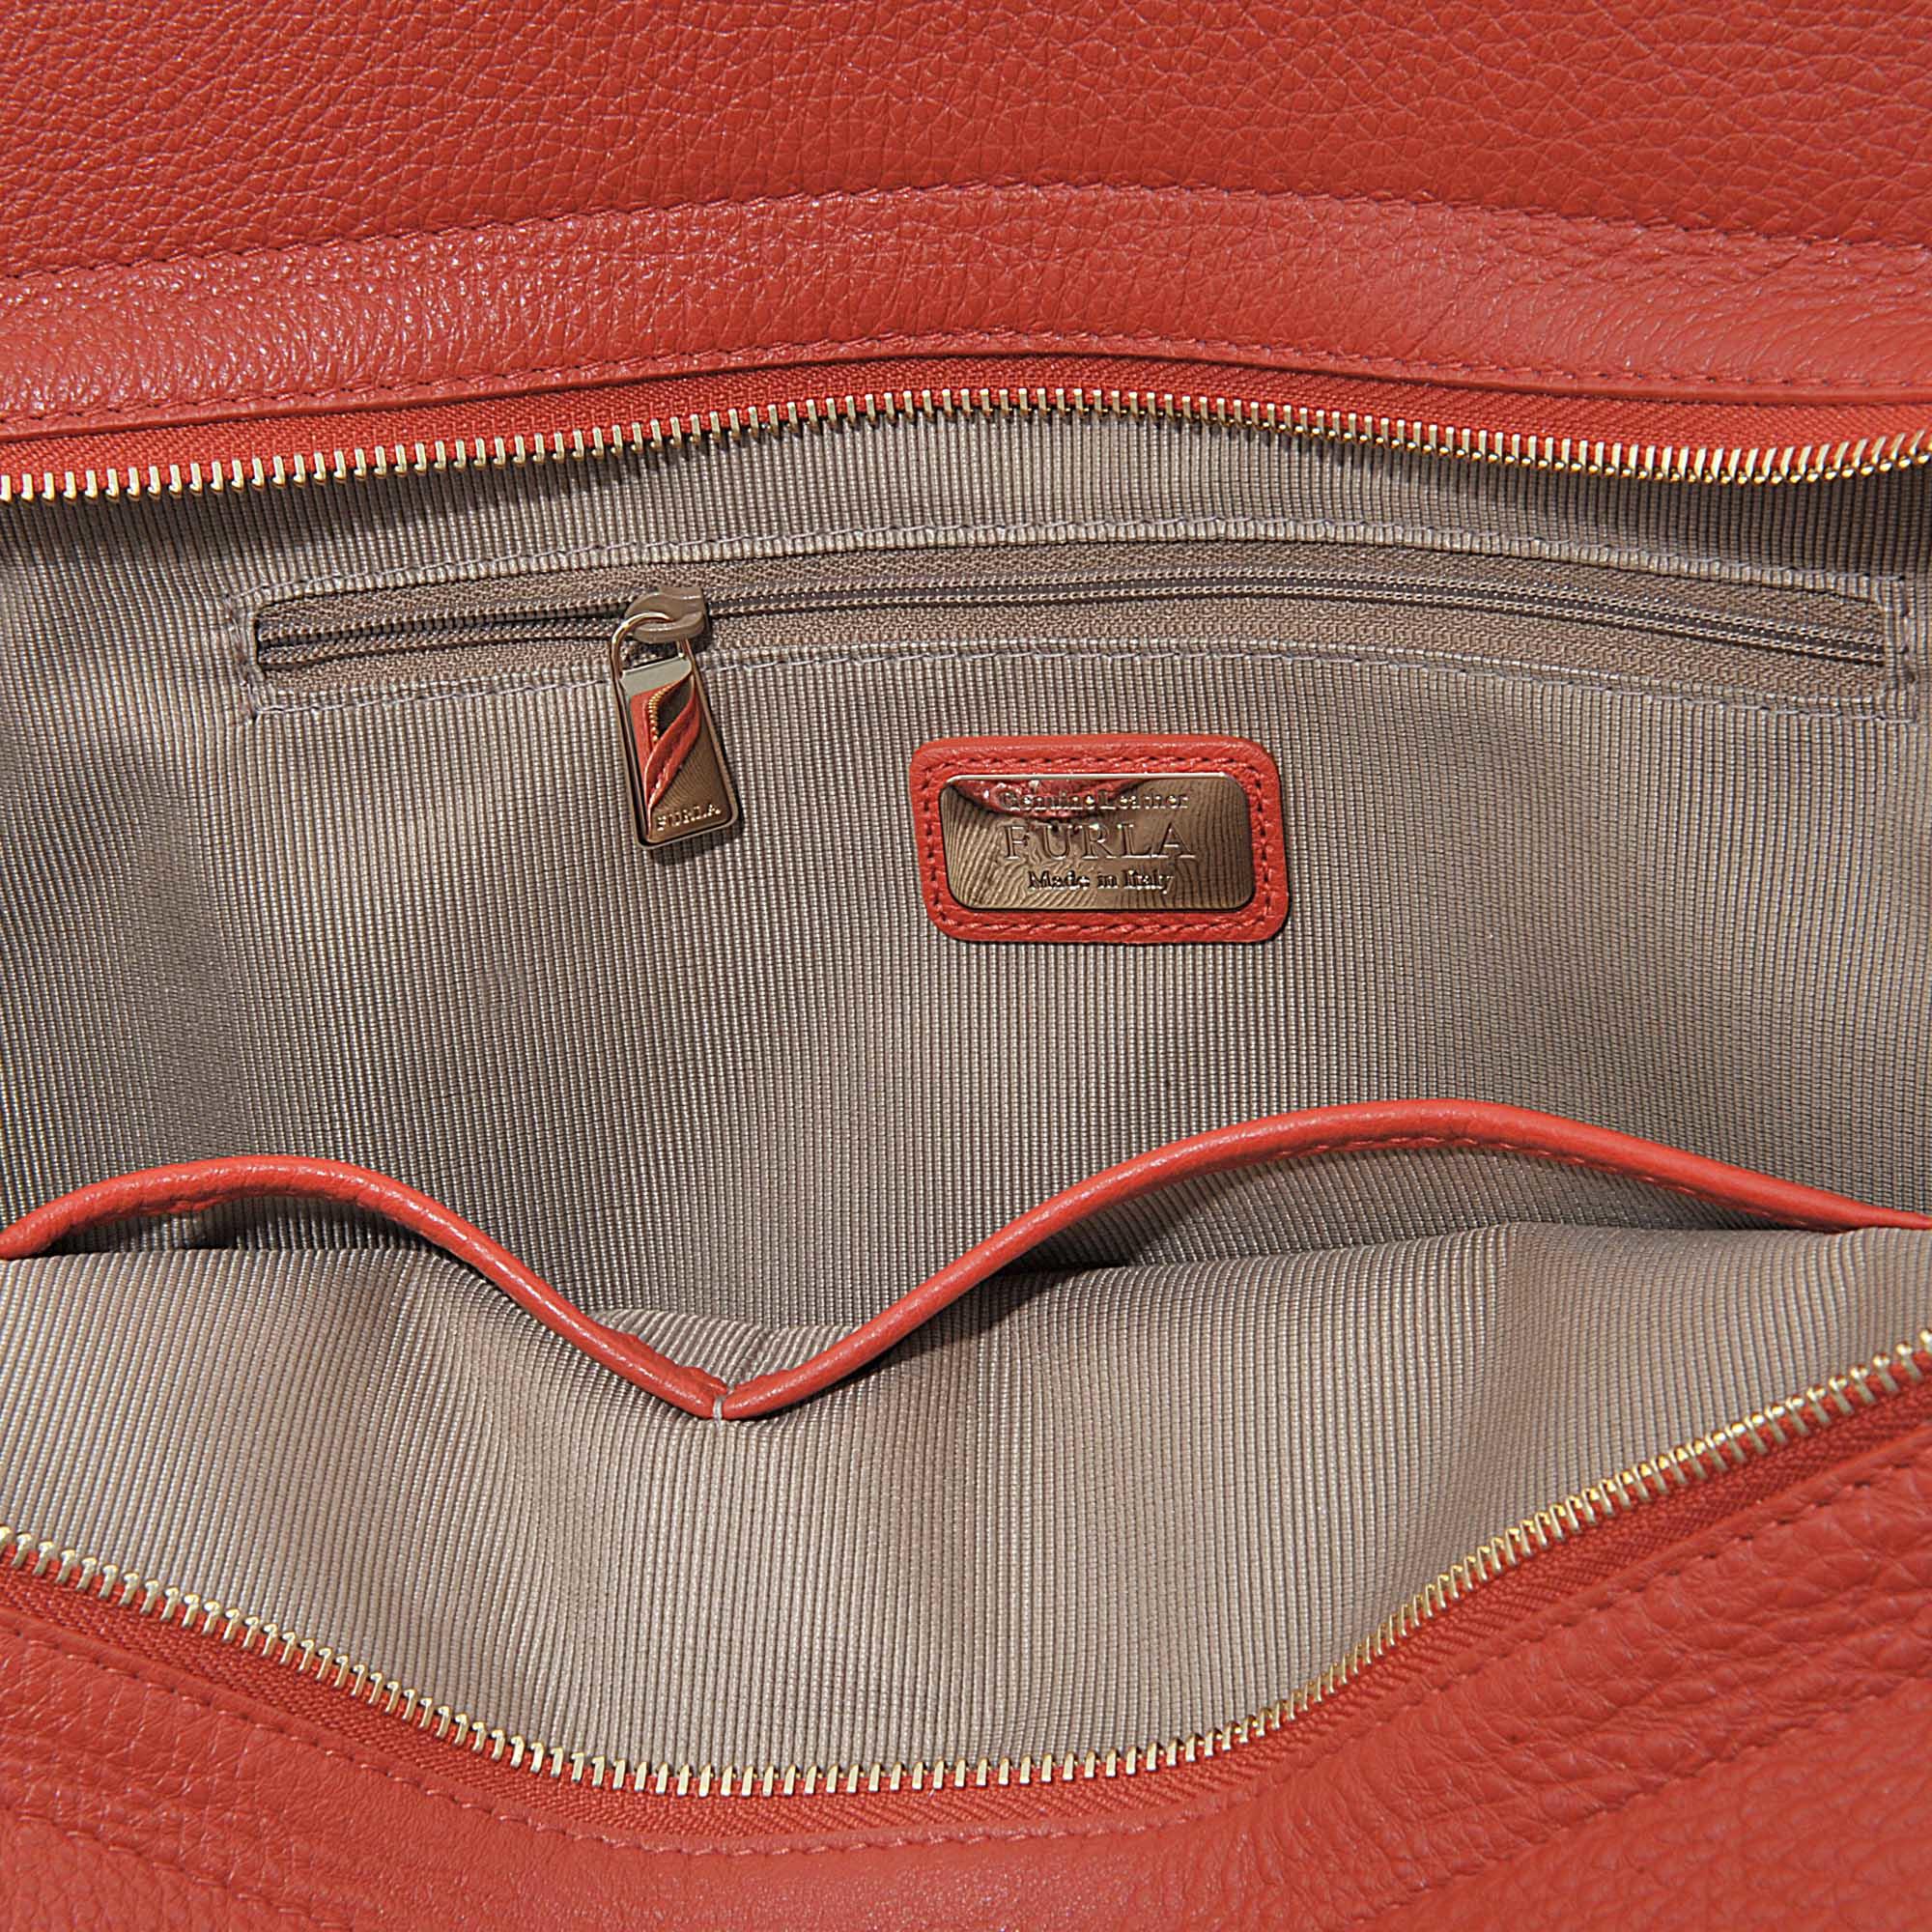 ysl handbag replica - Furla College L Bag in Orange | Lyst